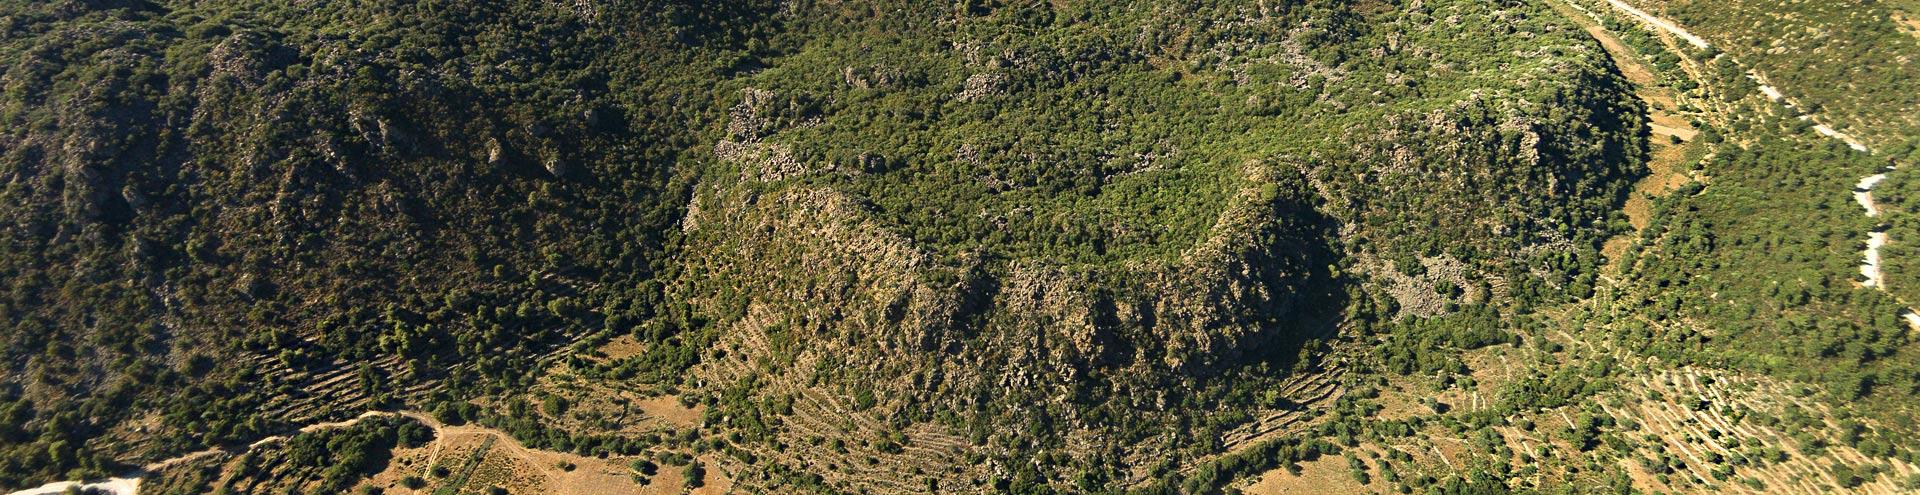 The fissure eruption Rethi